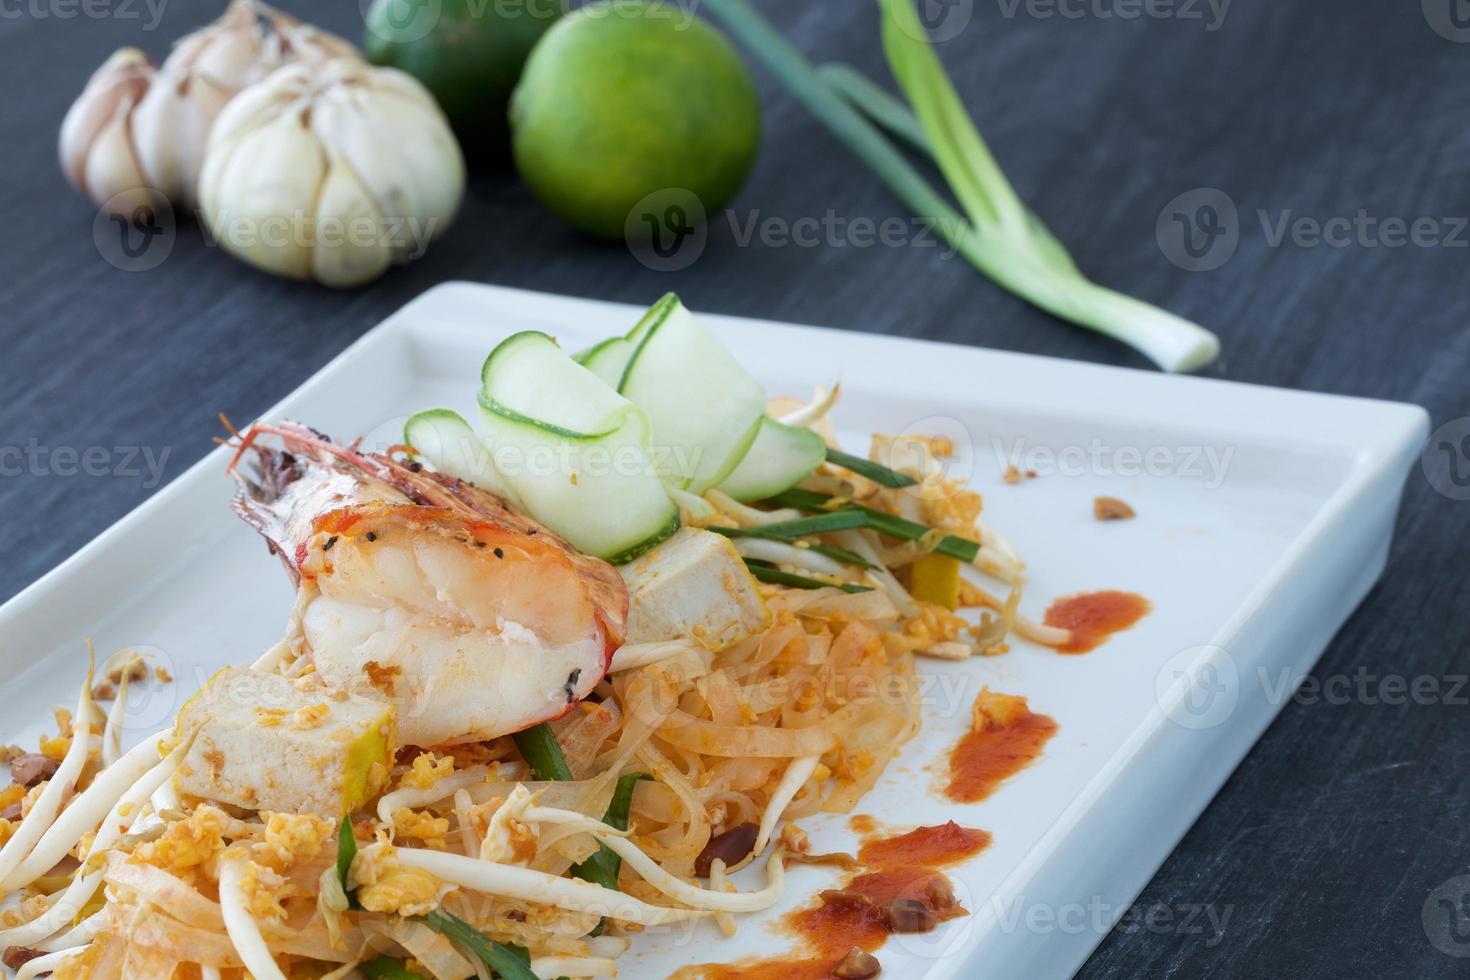 pad thai, garnalen en groente op plaat met ingrediënten rondom foto